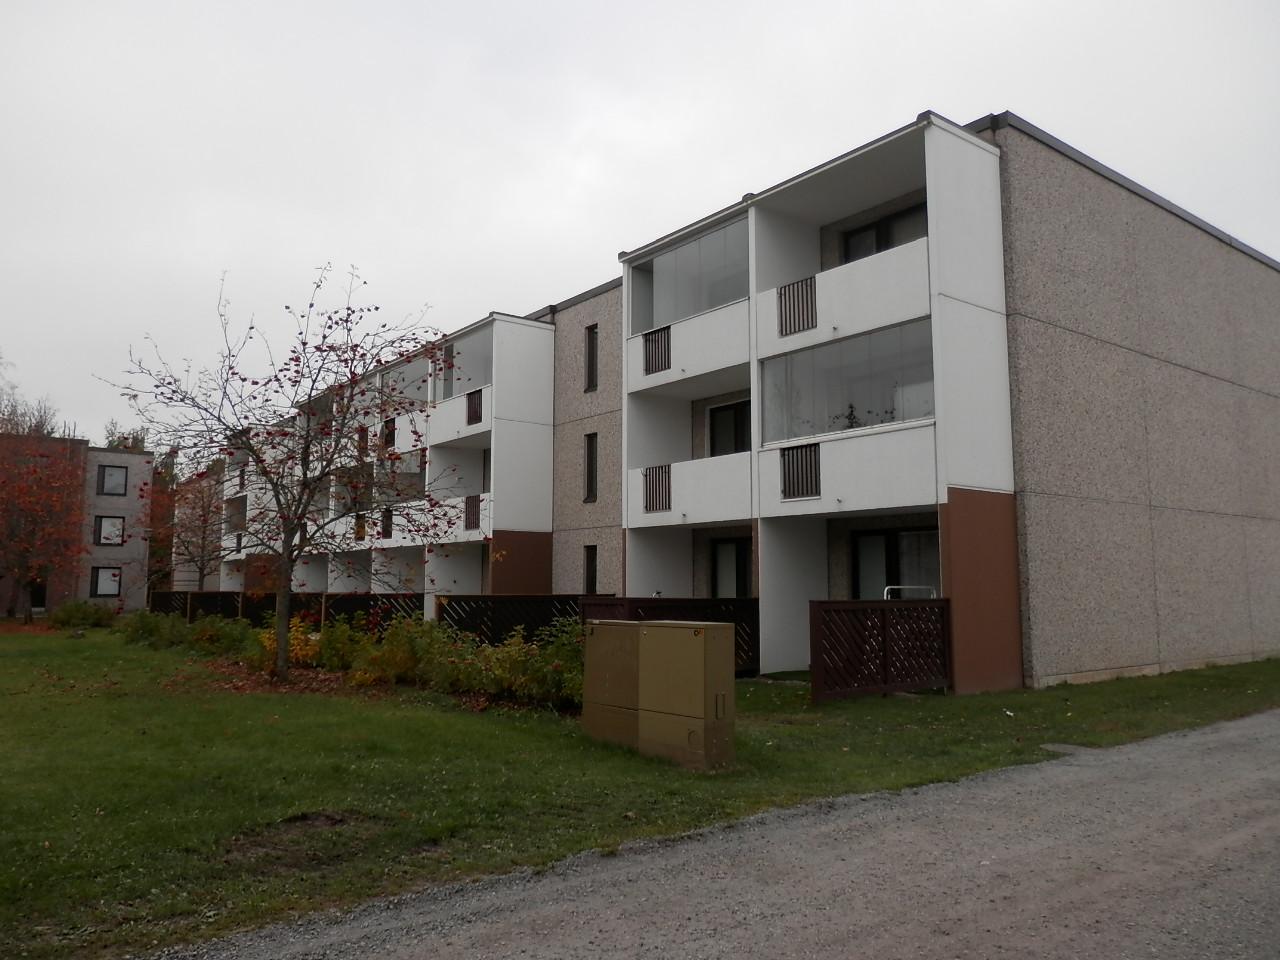 Nurmenpolku 6 D, Loimaa